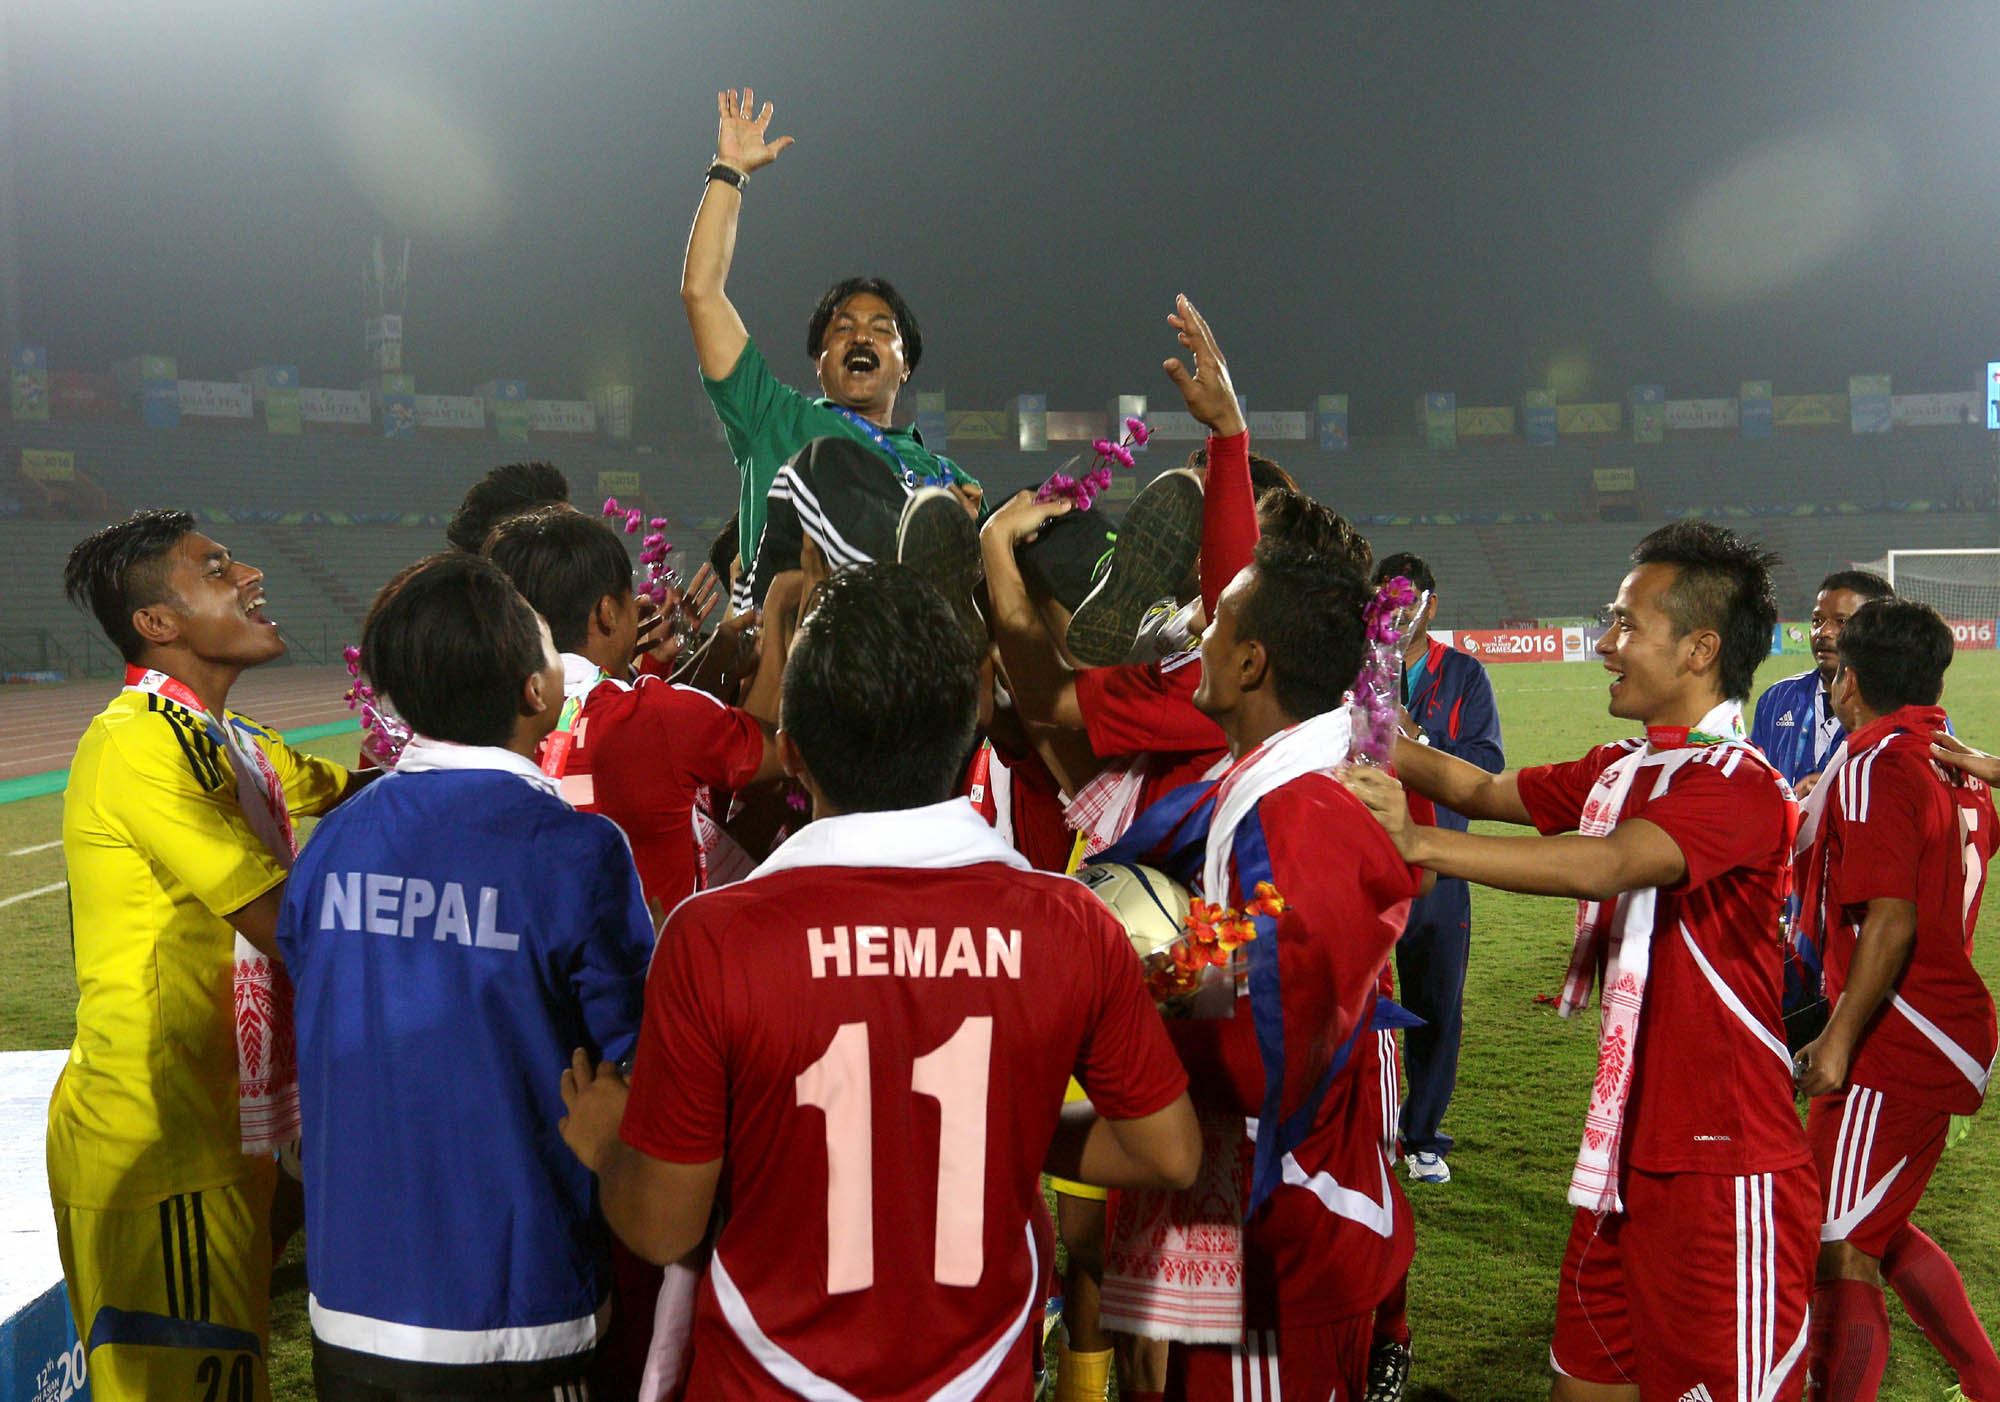 Raju Kaji Shakya and Nepali Player win India in South Asian Games 2016 1